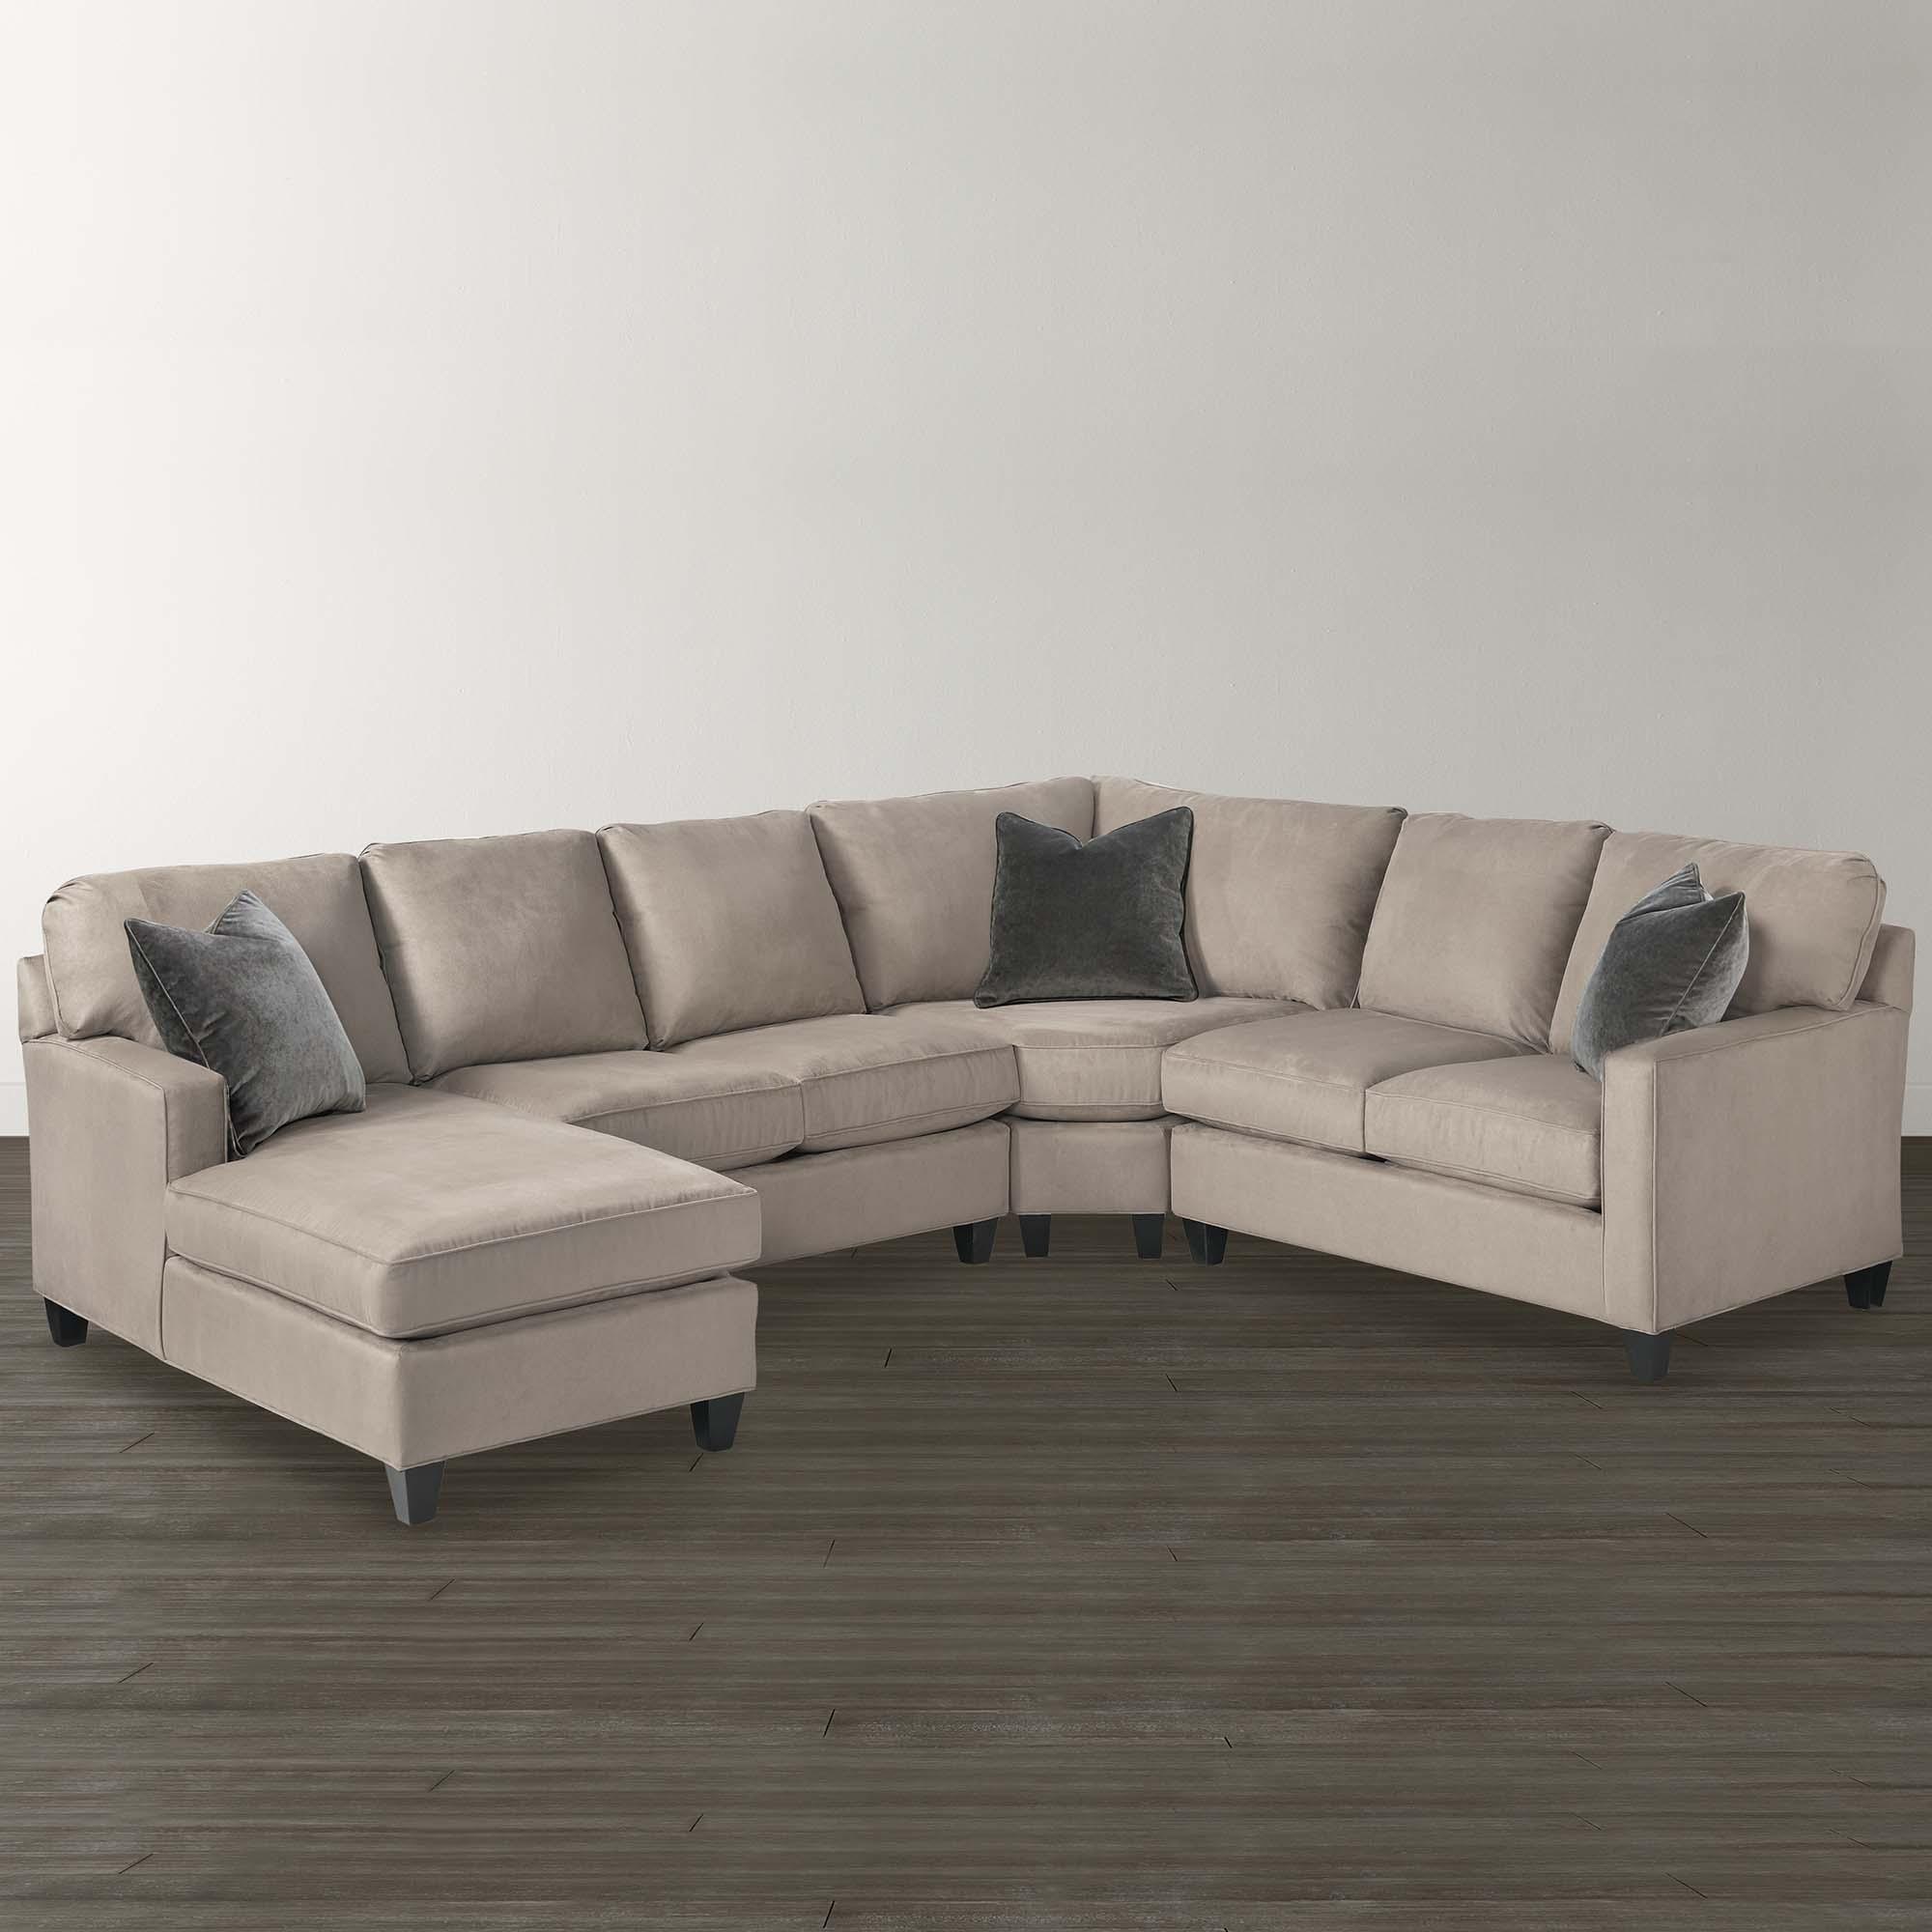 Dania Sectional Sofas Pertaining To Newest Sofa : Sofa Leather Sectional U Shape Creambassett Shaped (View 5 of 15)